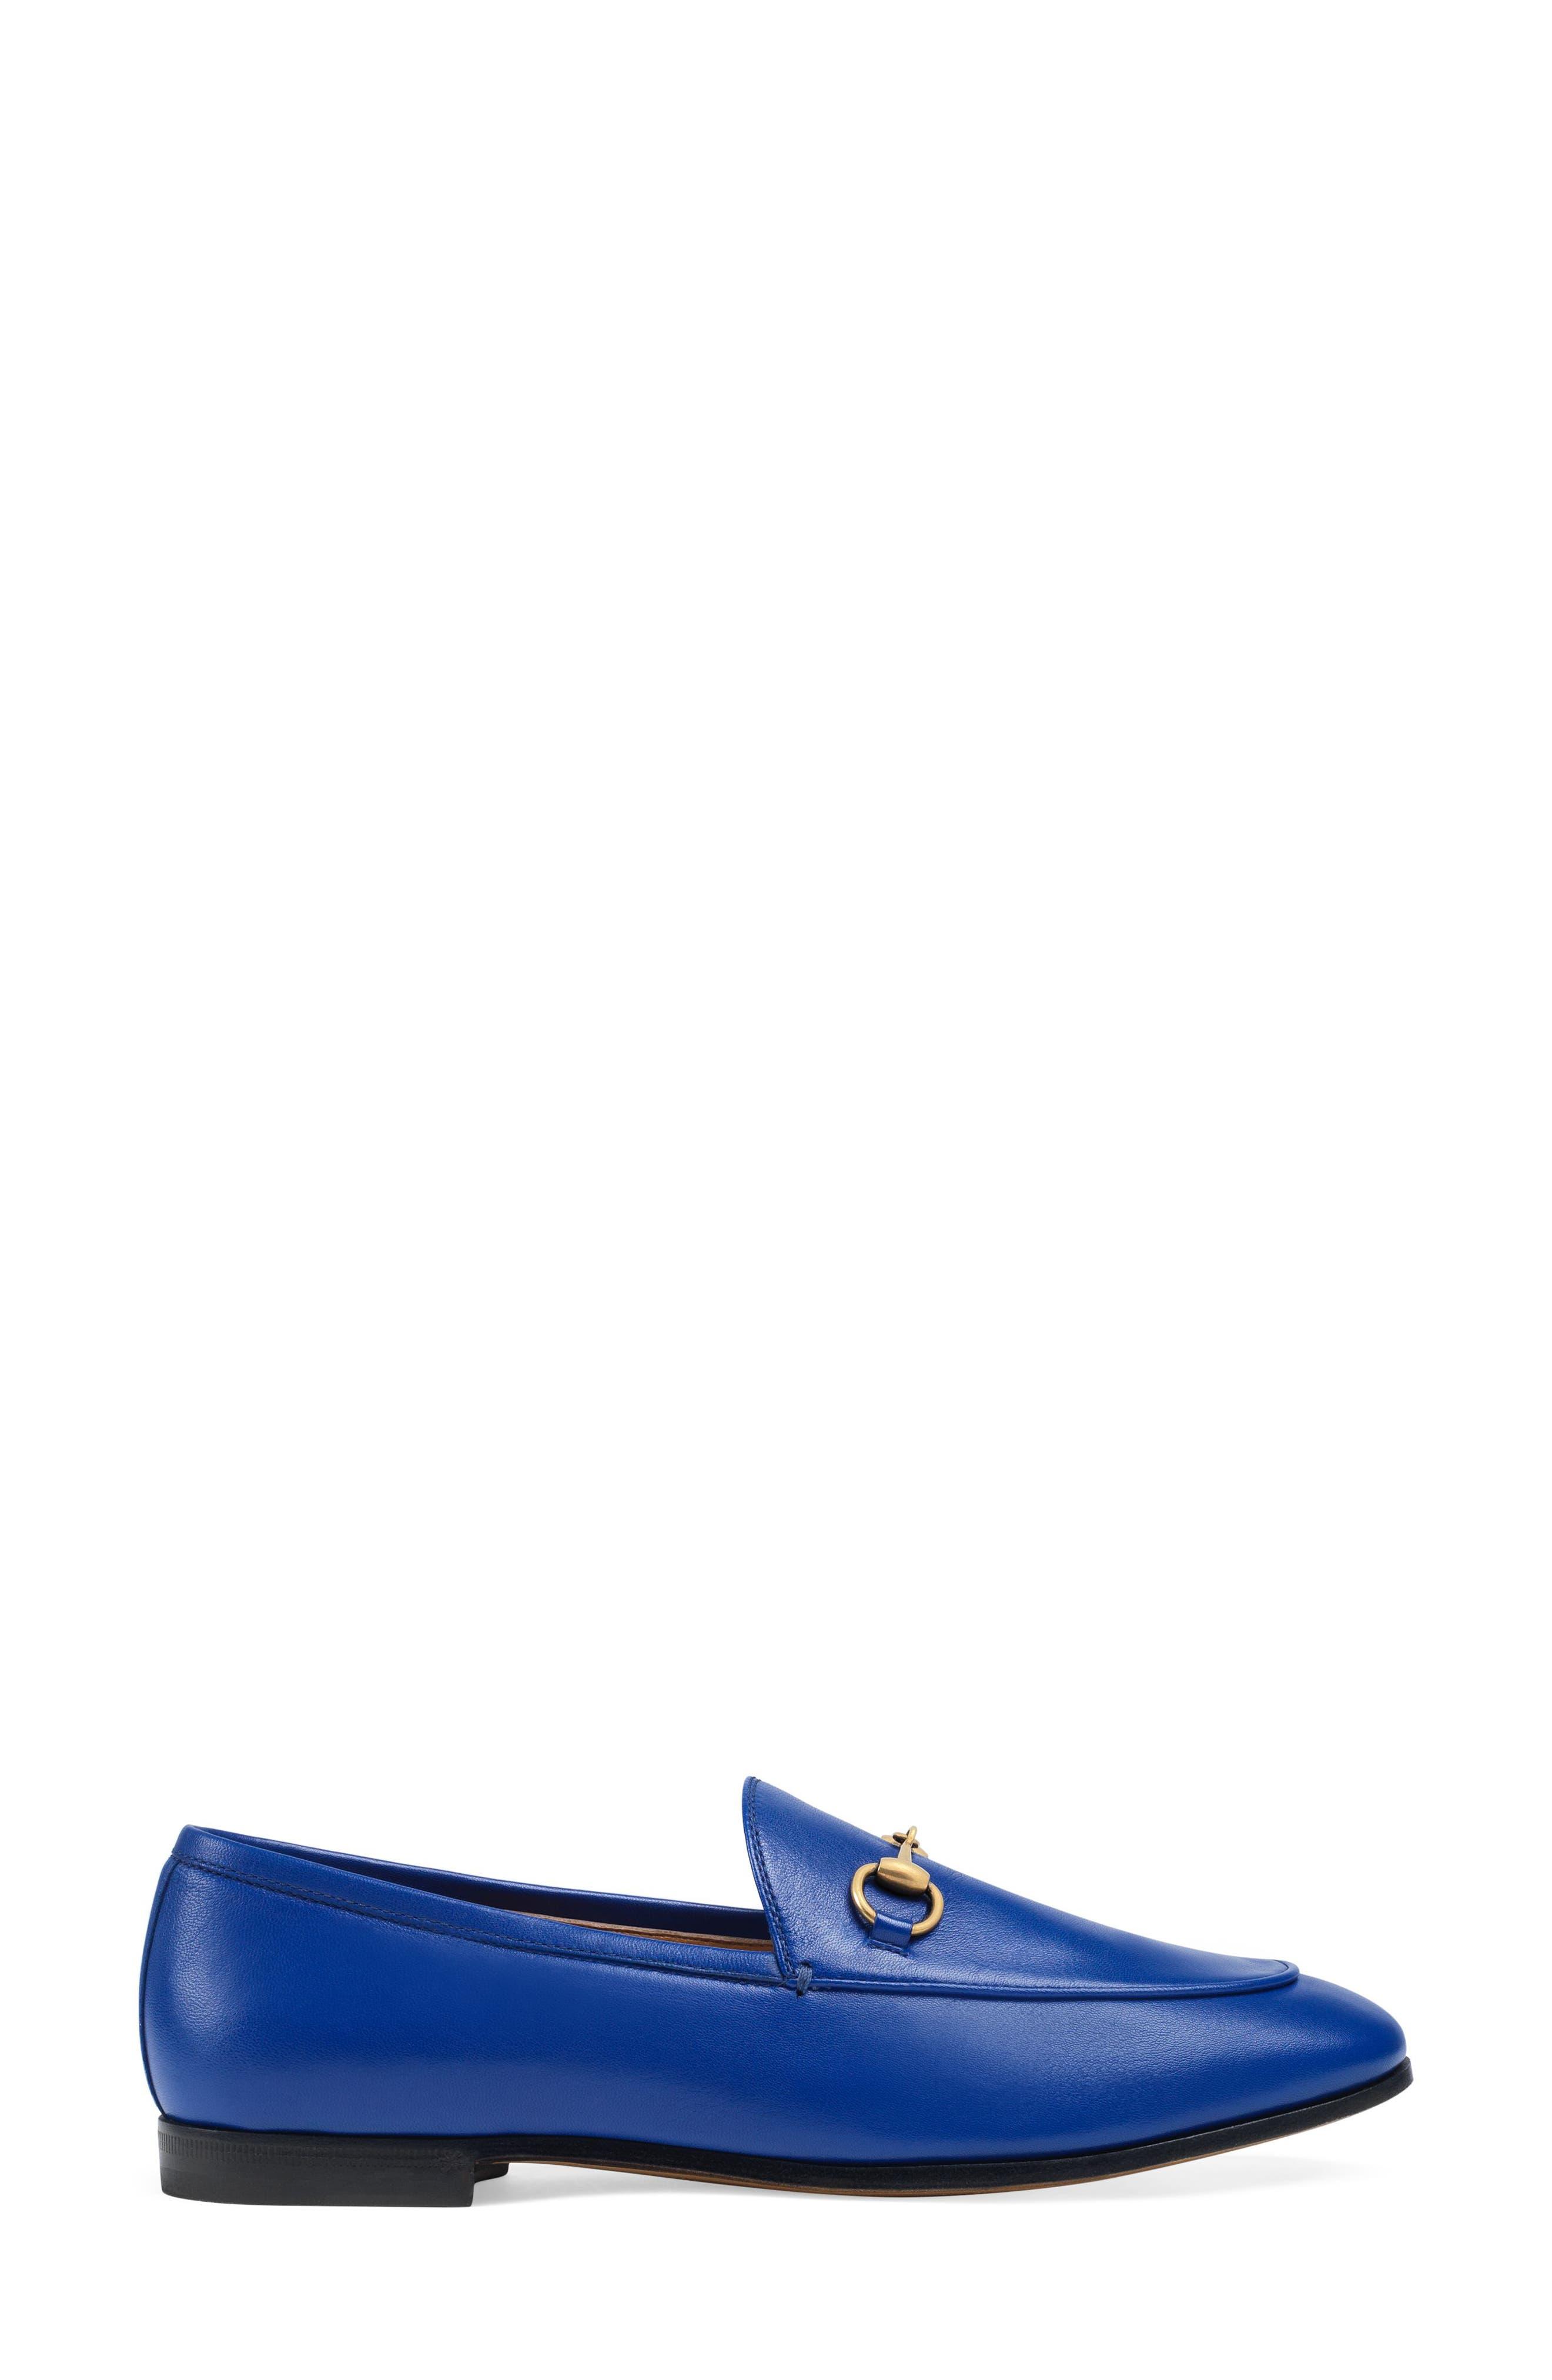 Alternate Image 2  - Gucci 'Jordaan' Loafer (Women)